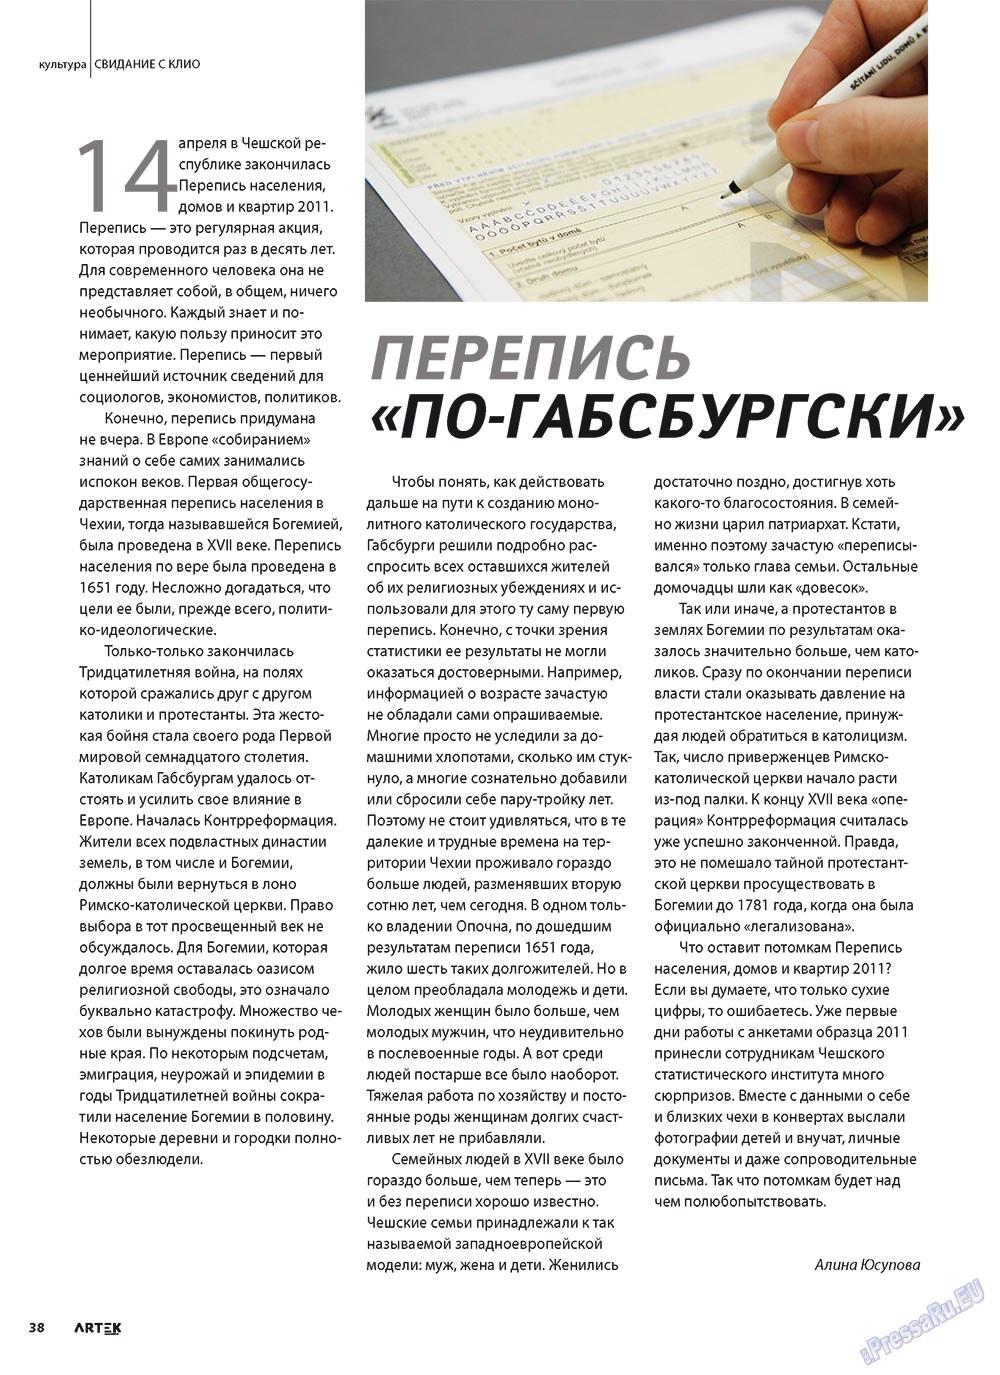 Артек (журнал). 2011 год, номер 2, стр. 40